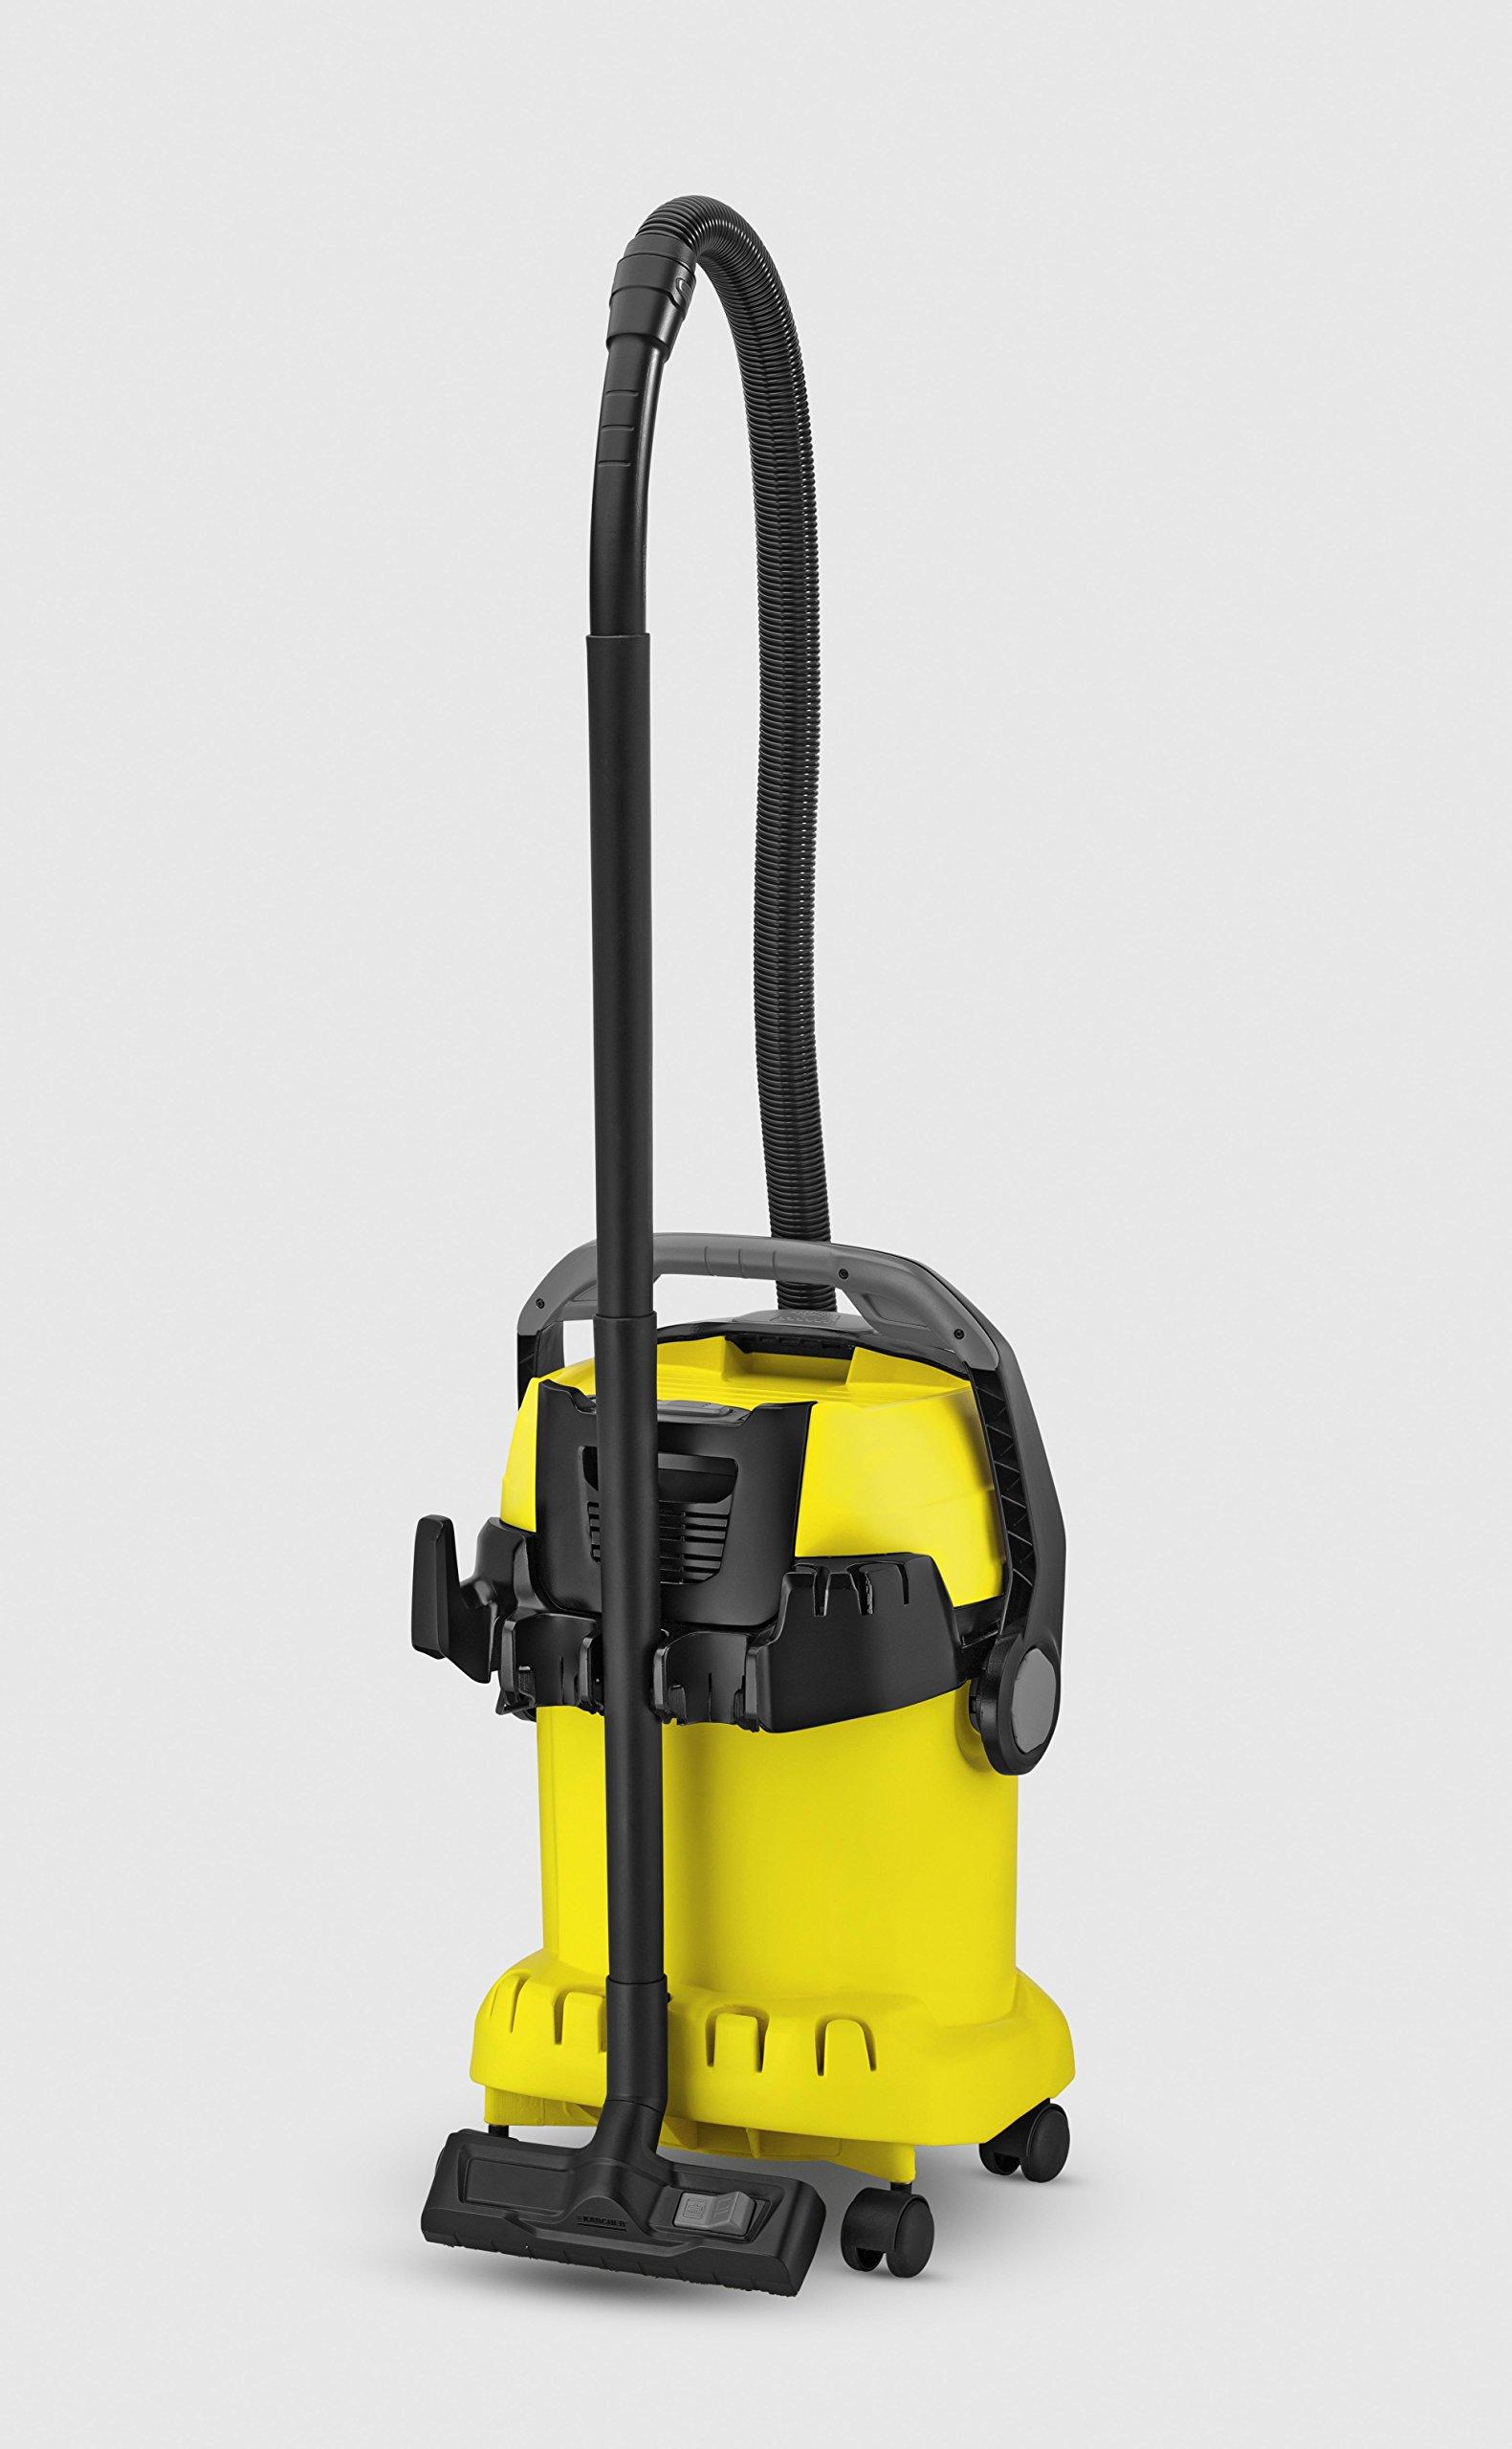 Kärcher WD 5 - Dry-Wet-Staubsauger, 1100 W, 230 V, 25 L